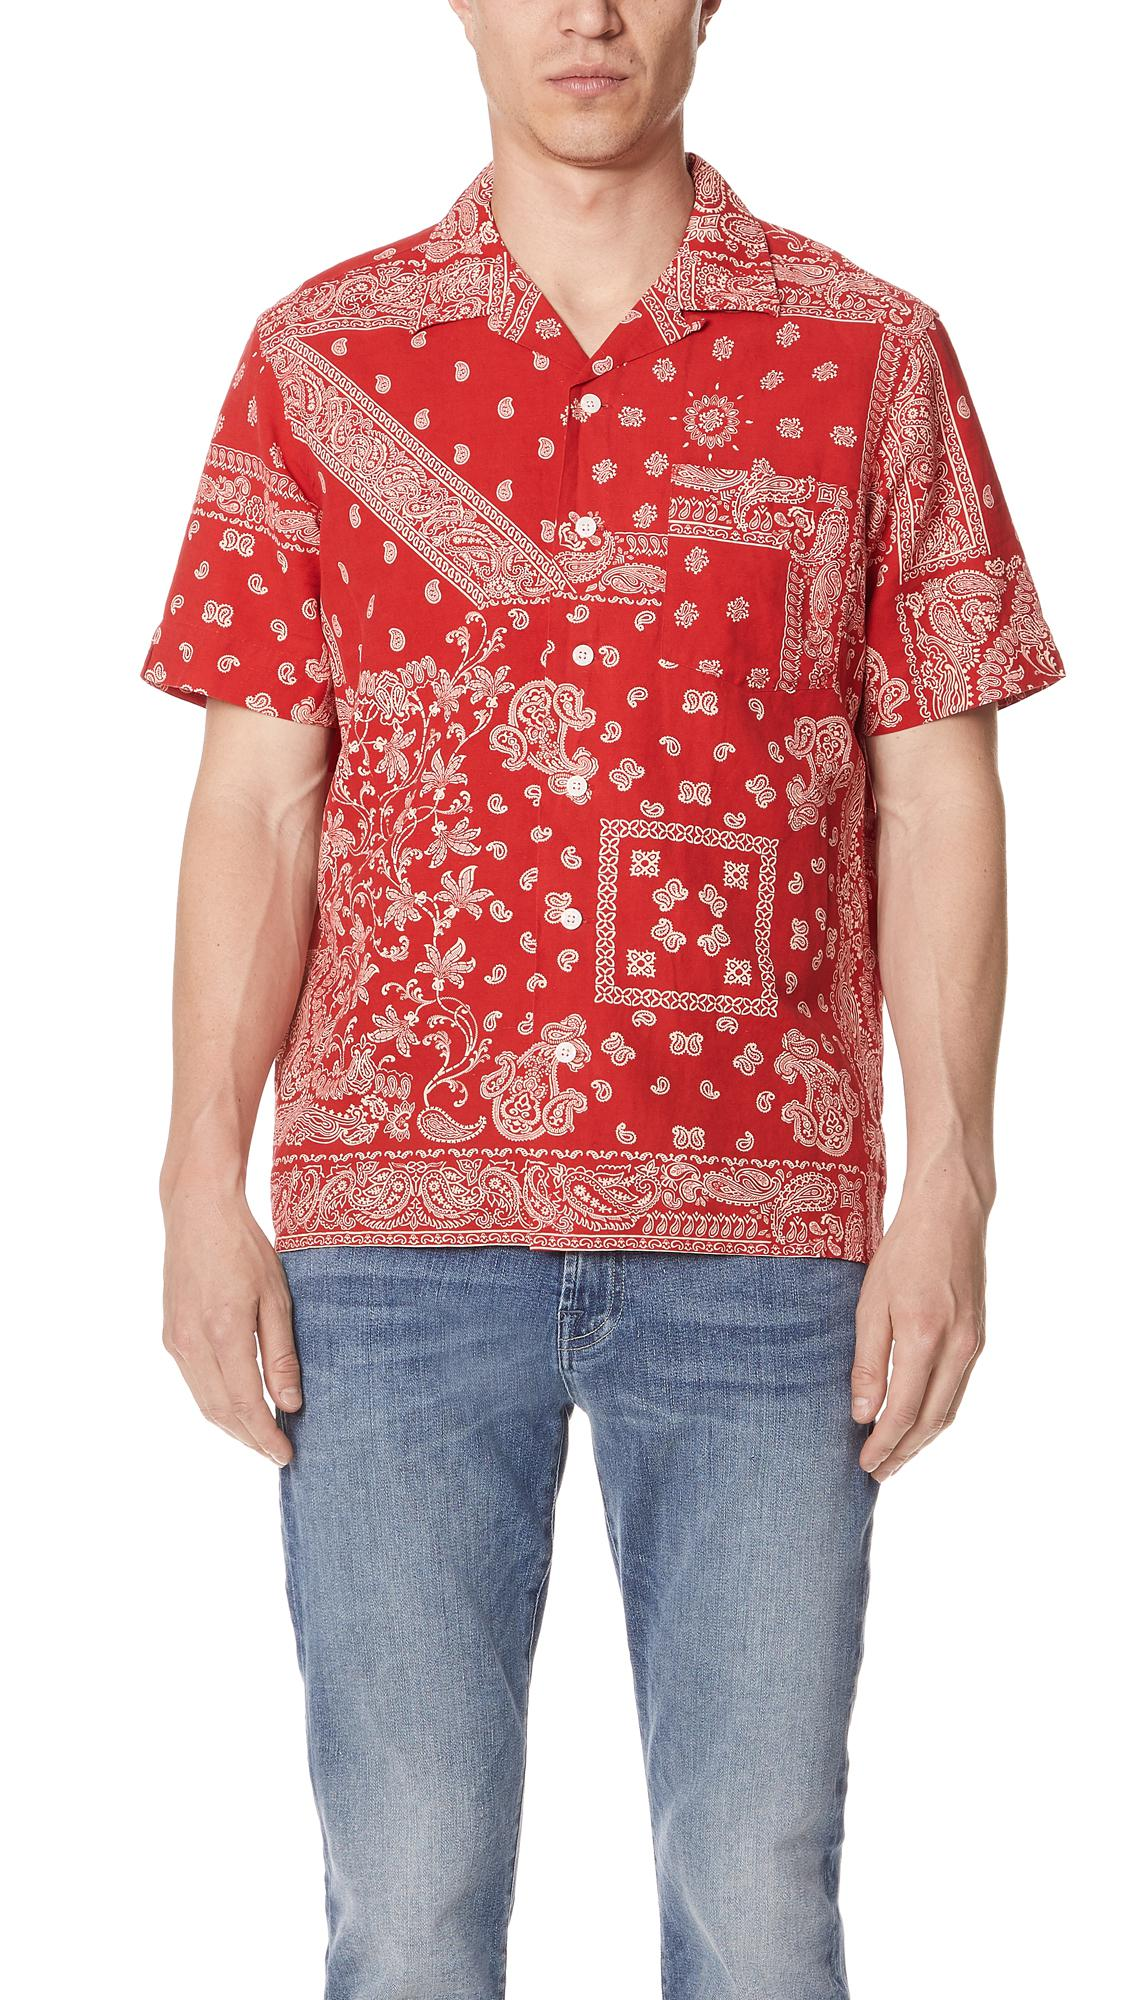 9829c1234 Polo Ralph Lauren Bandana Shirt in Red for Men - Lyst